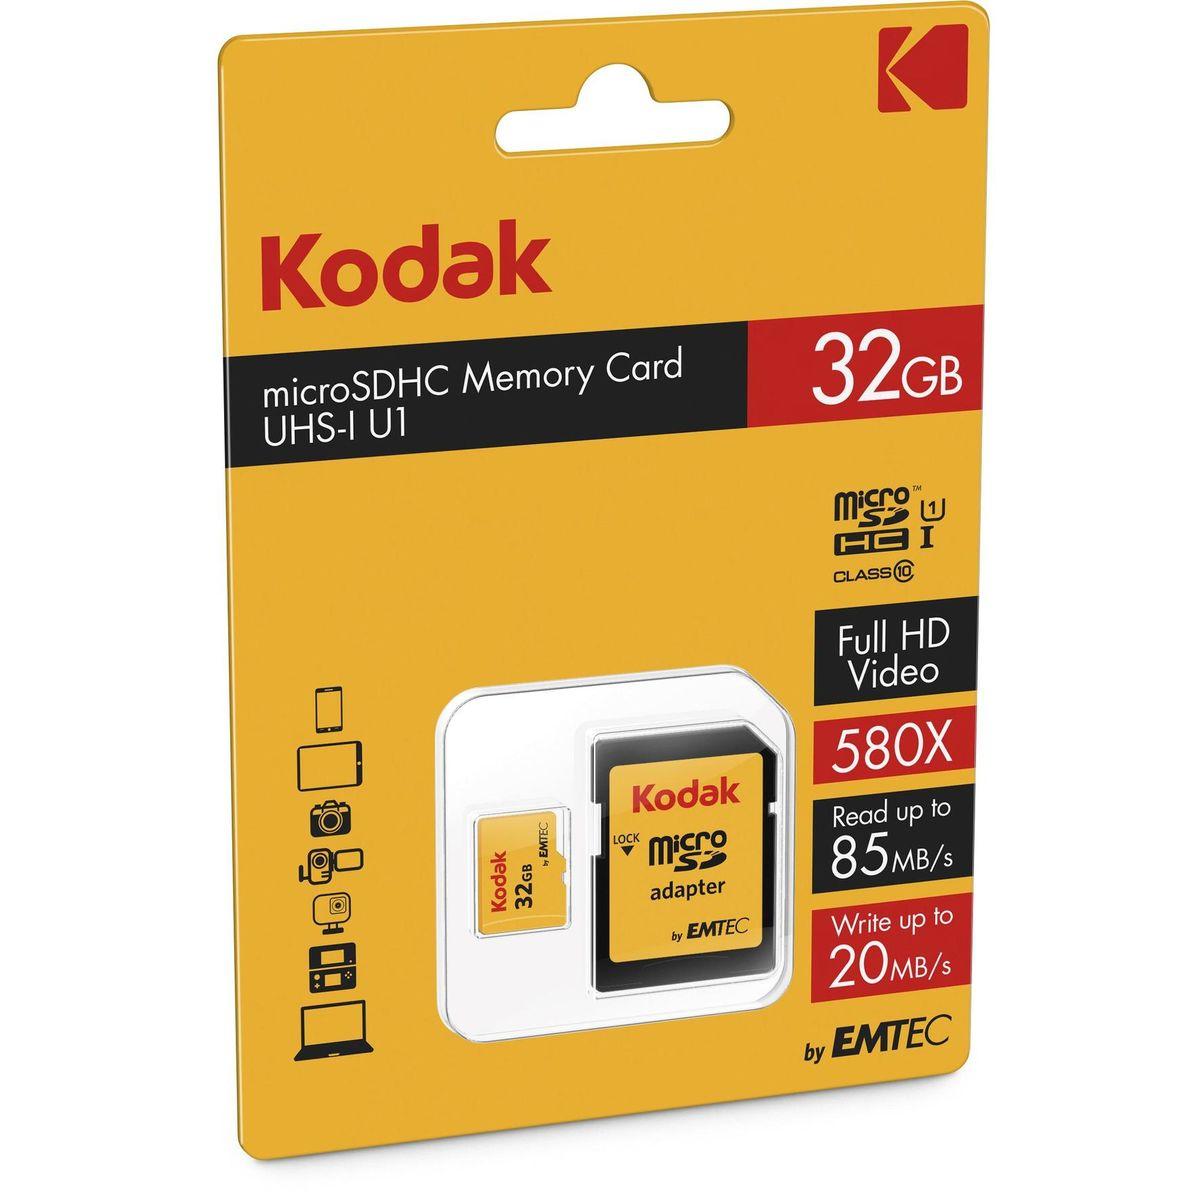 Kodak Geheugenkaart micro SDHC 32GB + adapter